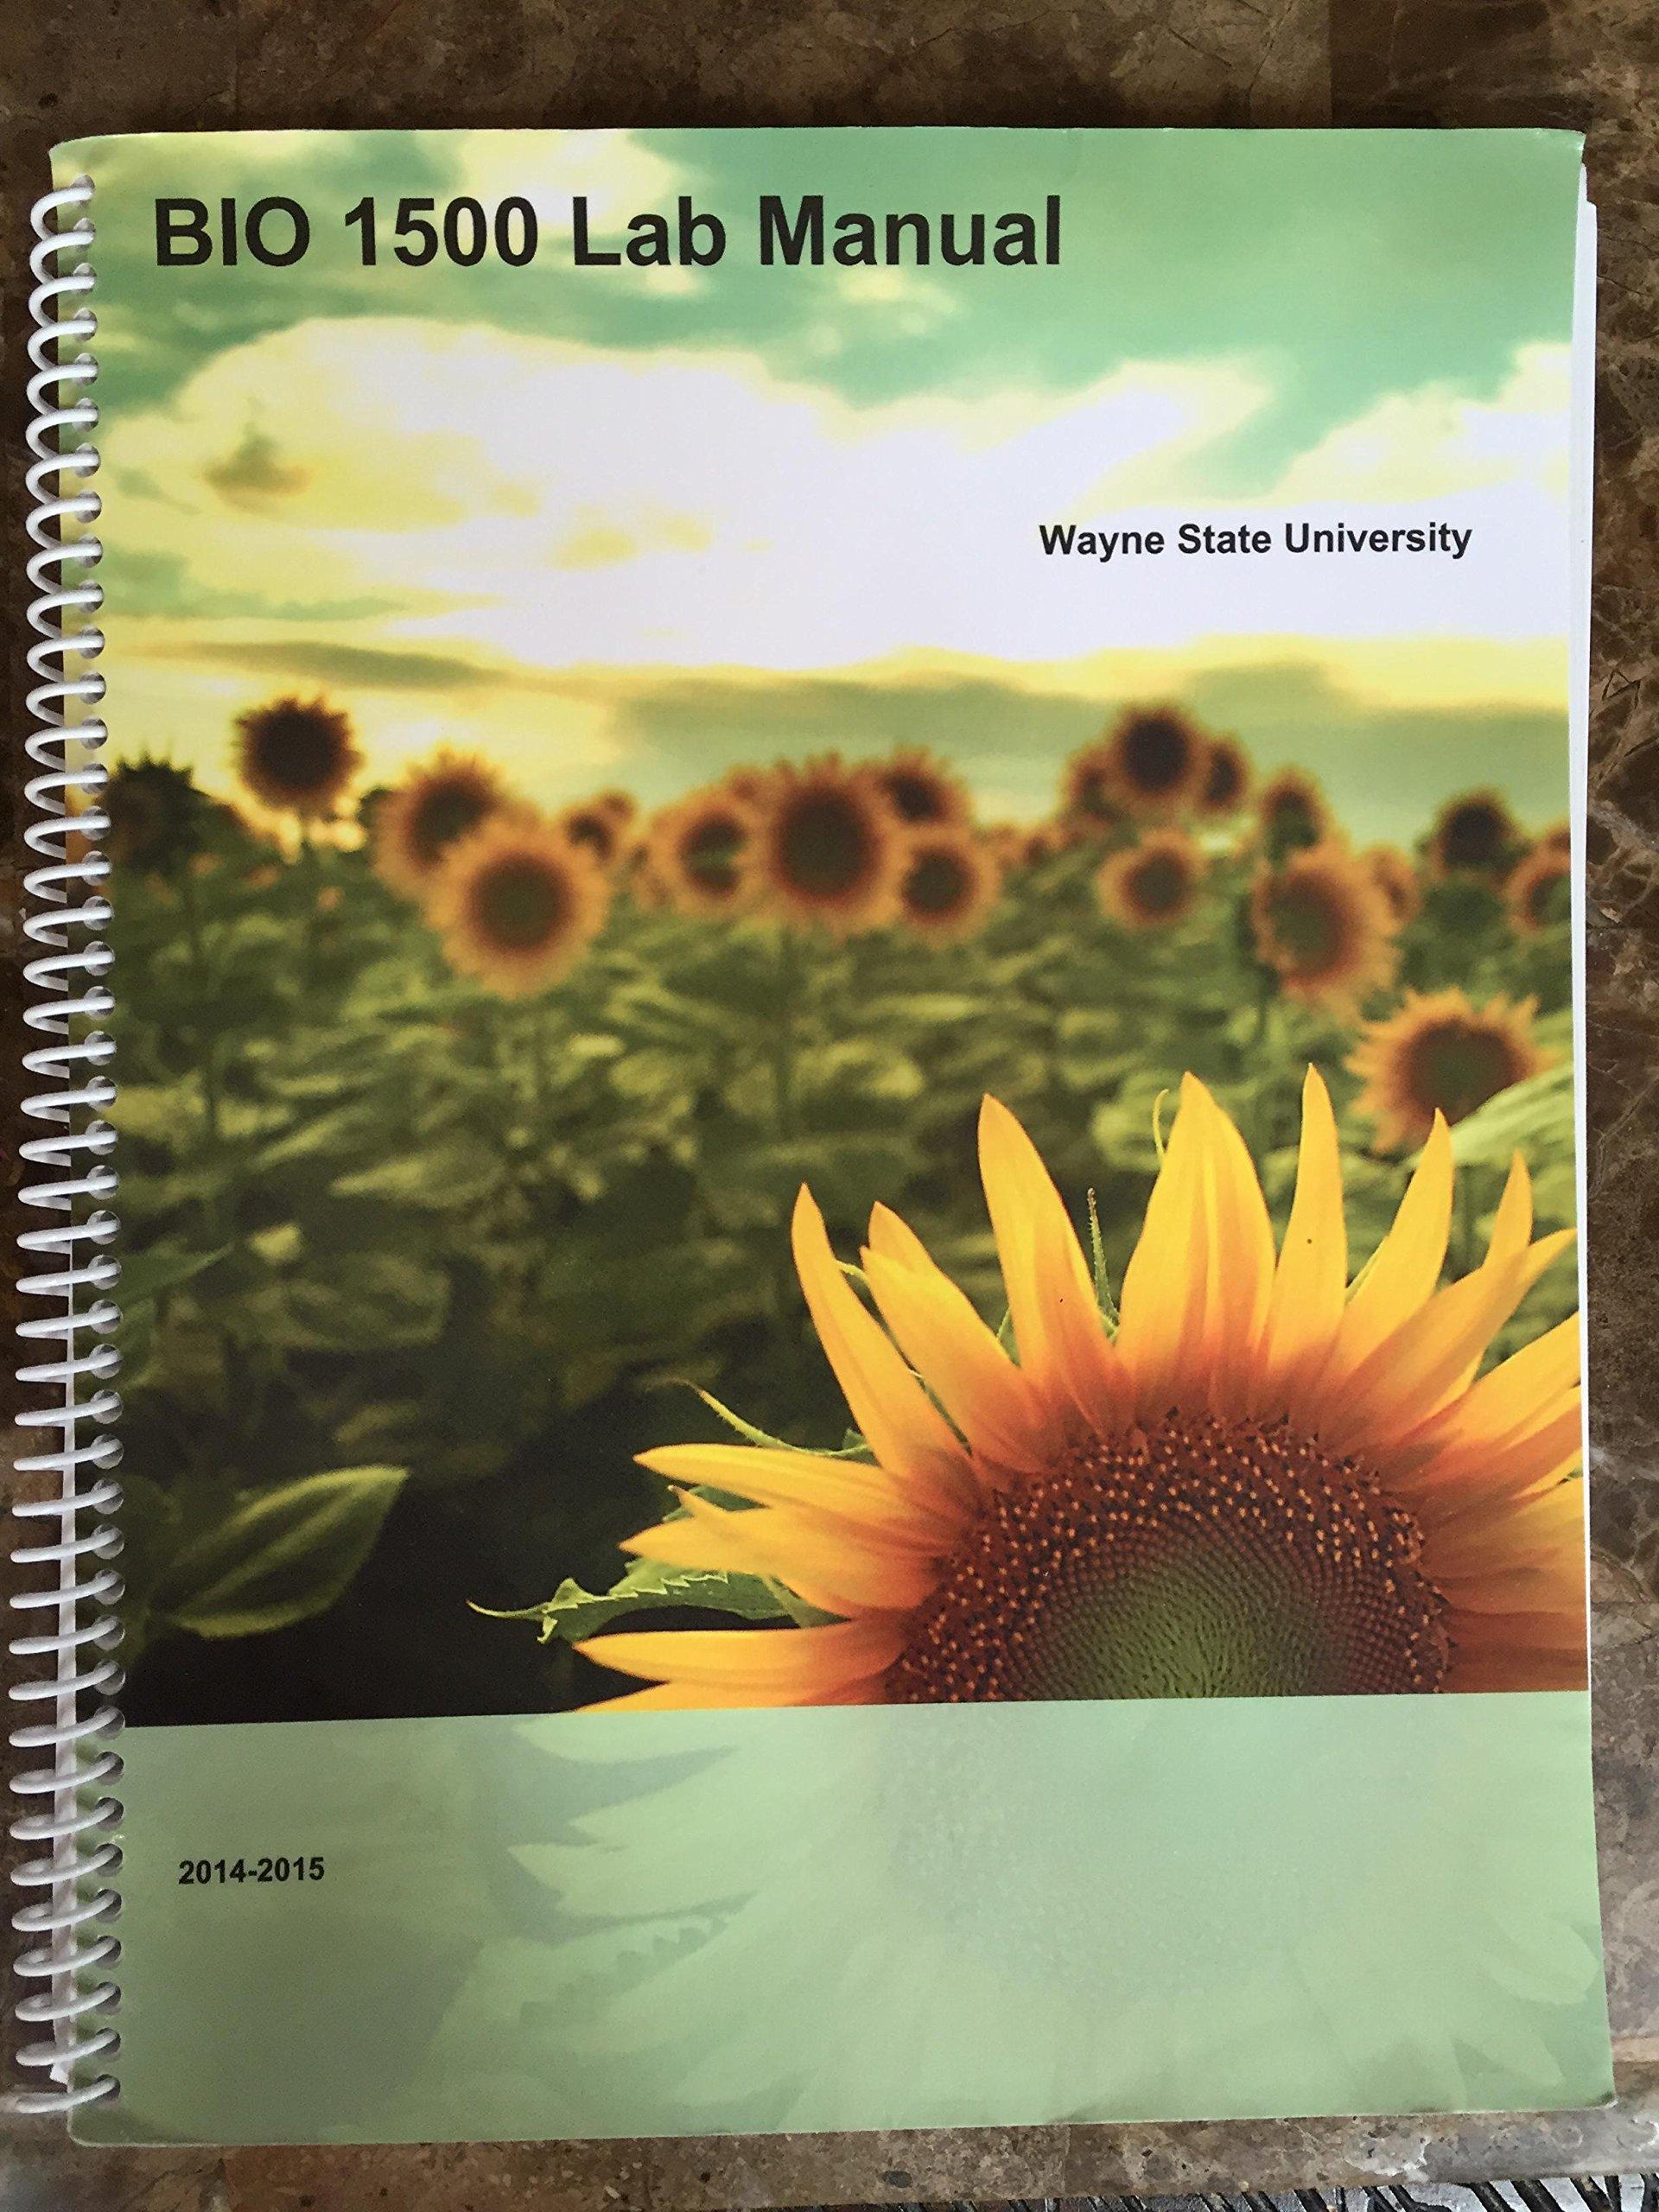 BIO 1500 Lab Manual, Wayne State University, 2014-2015: Amazon.com: Books